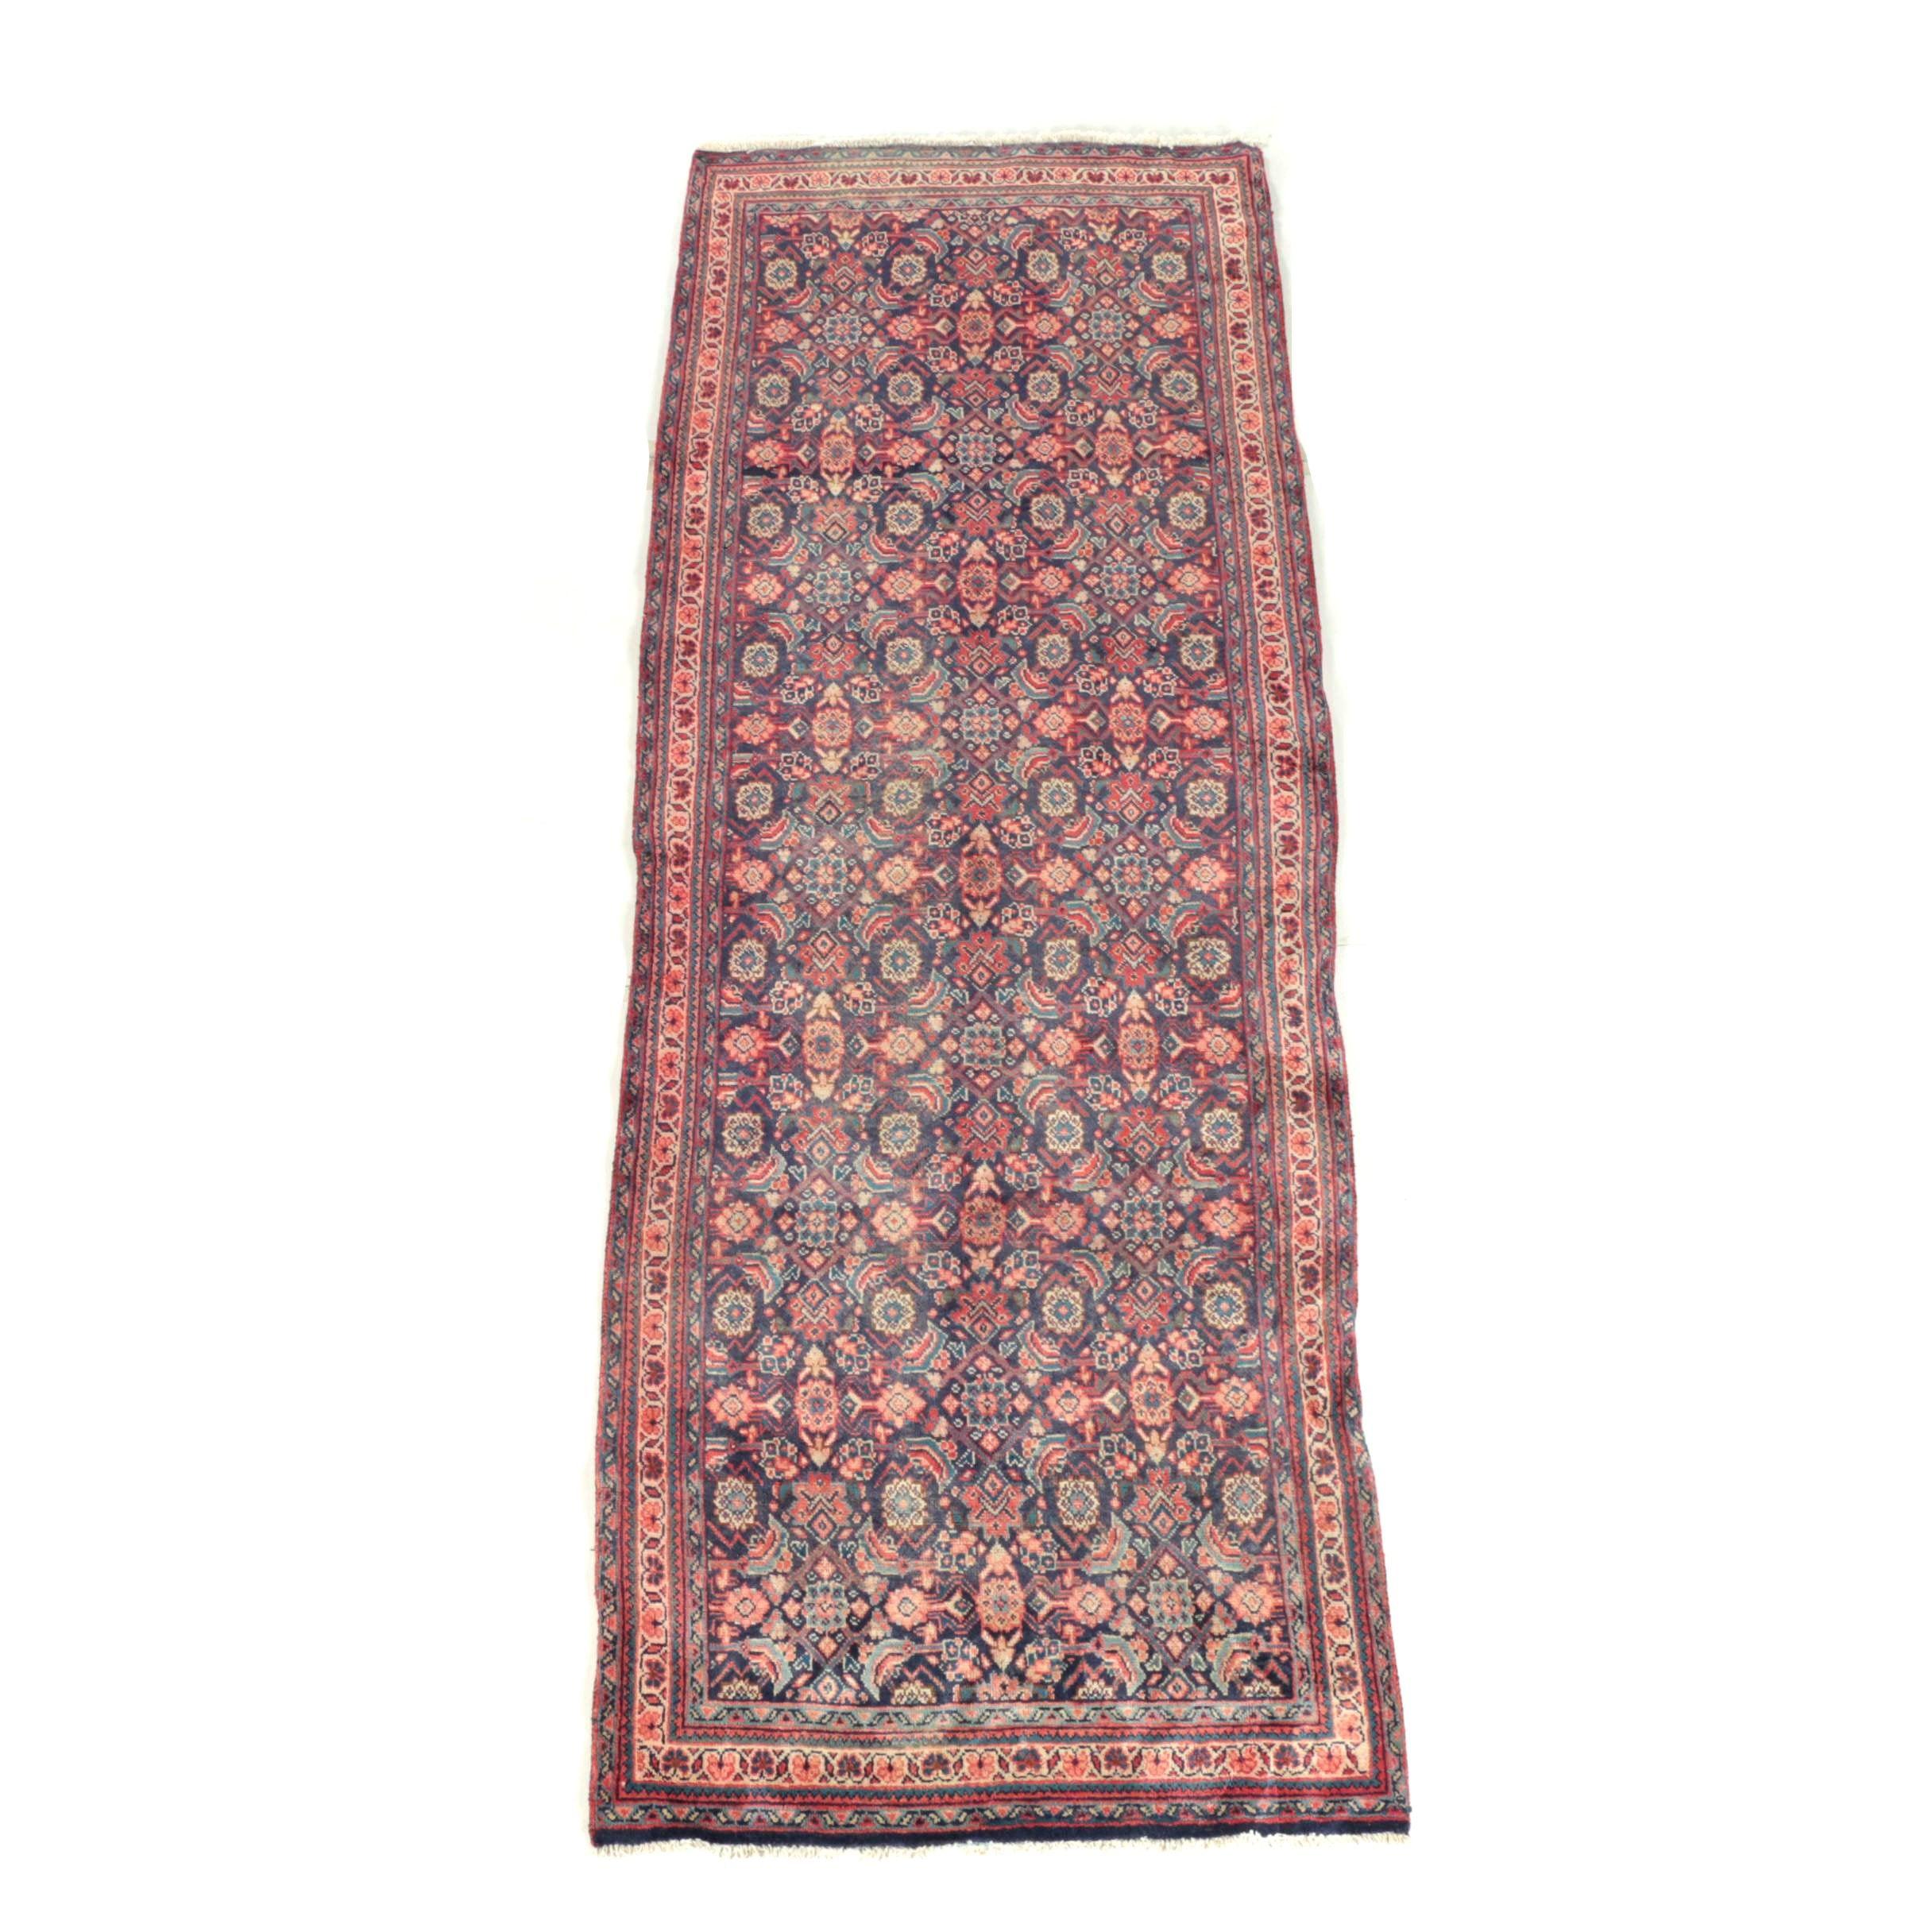 Hand-Knotted Persian Qashqai Wool Carpet Runner